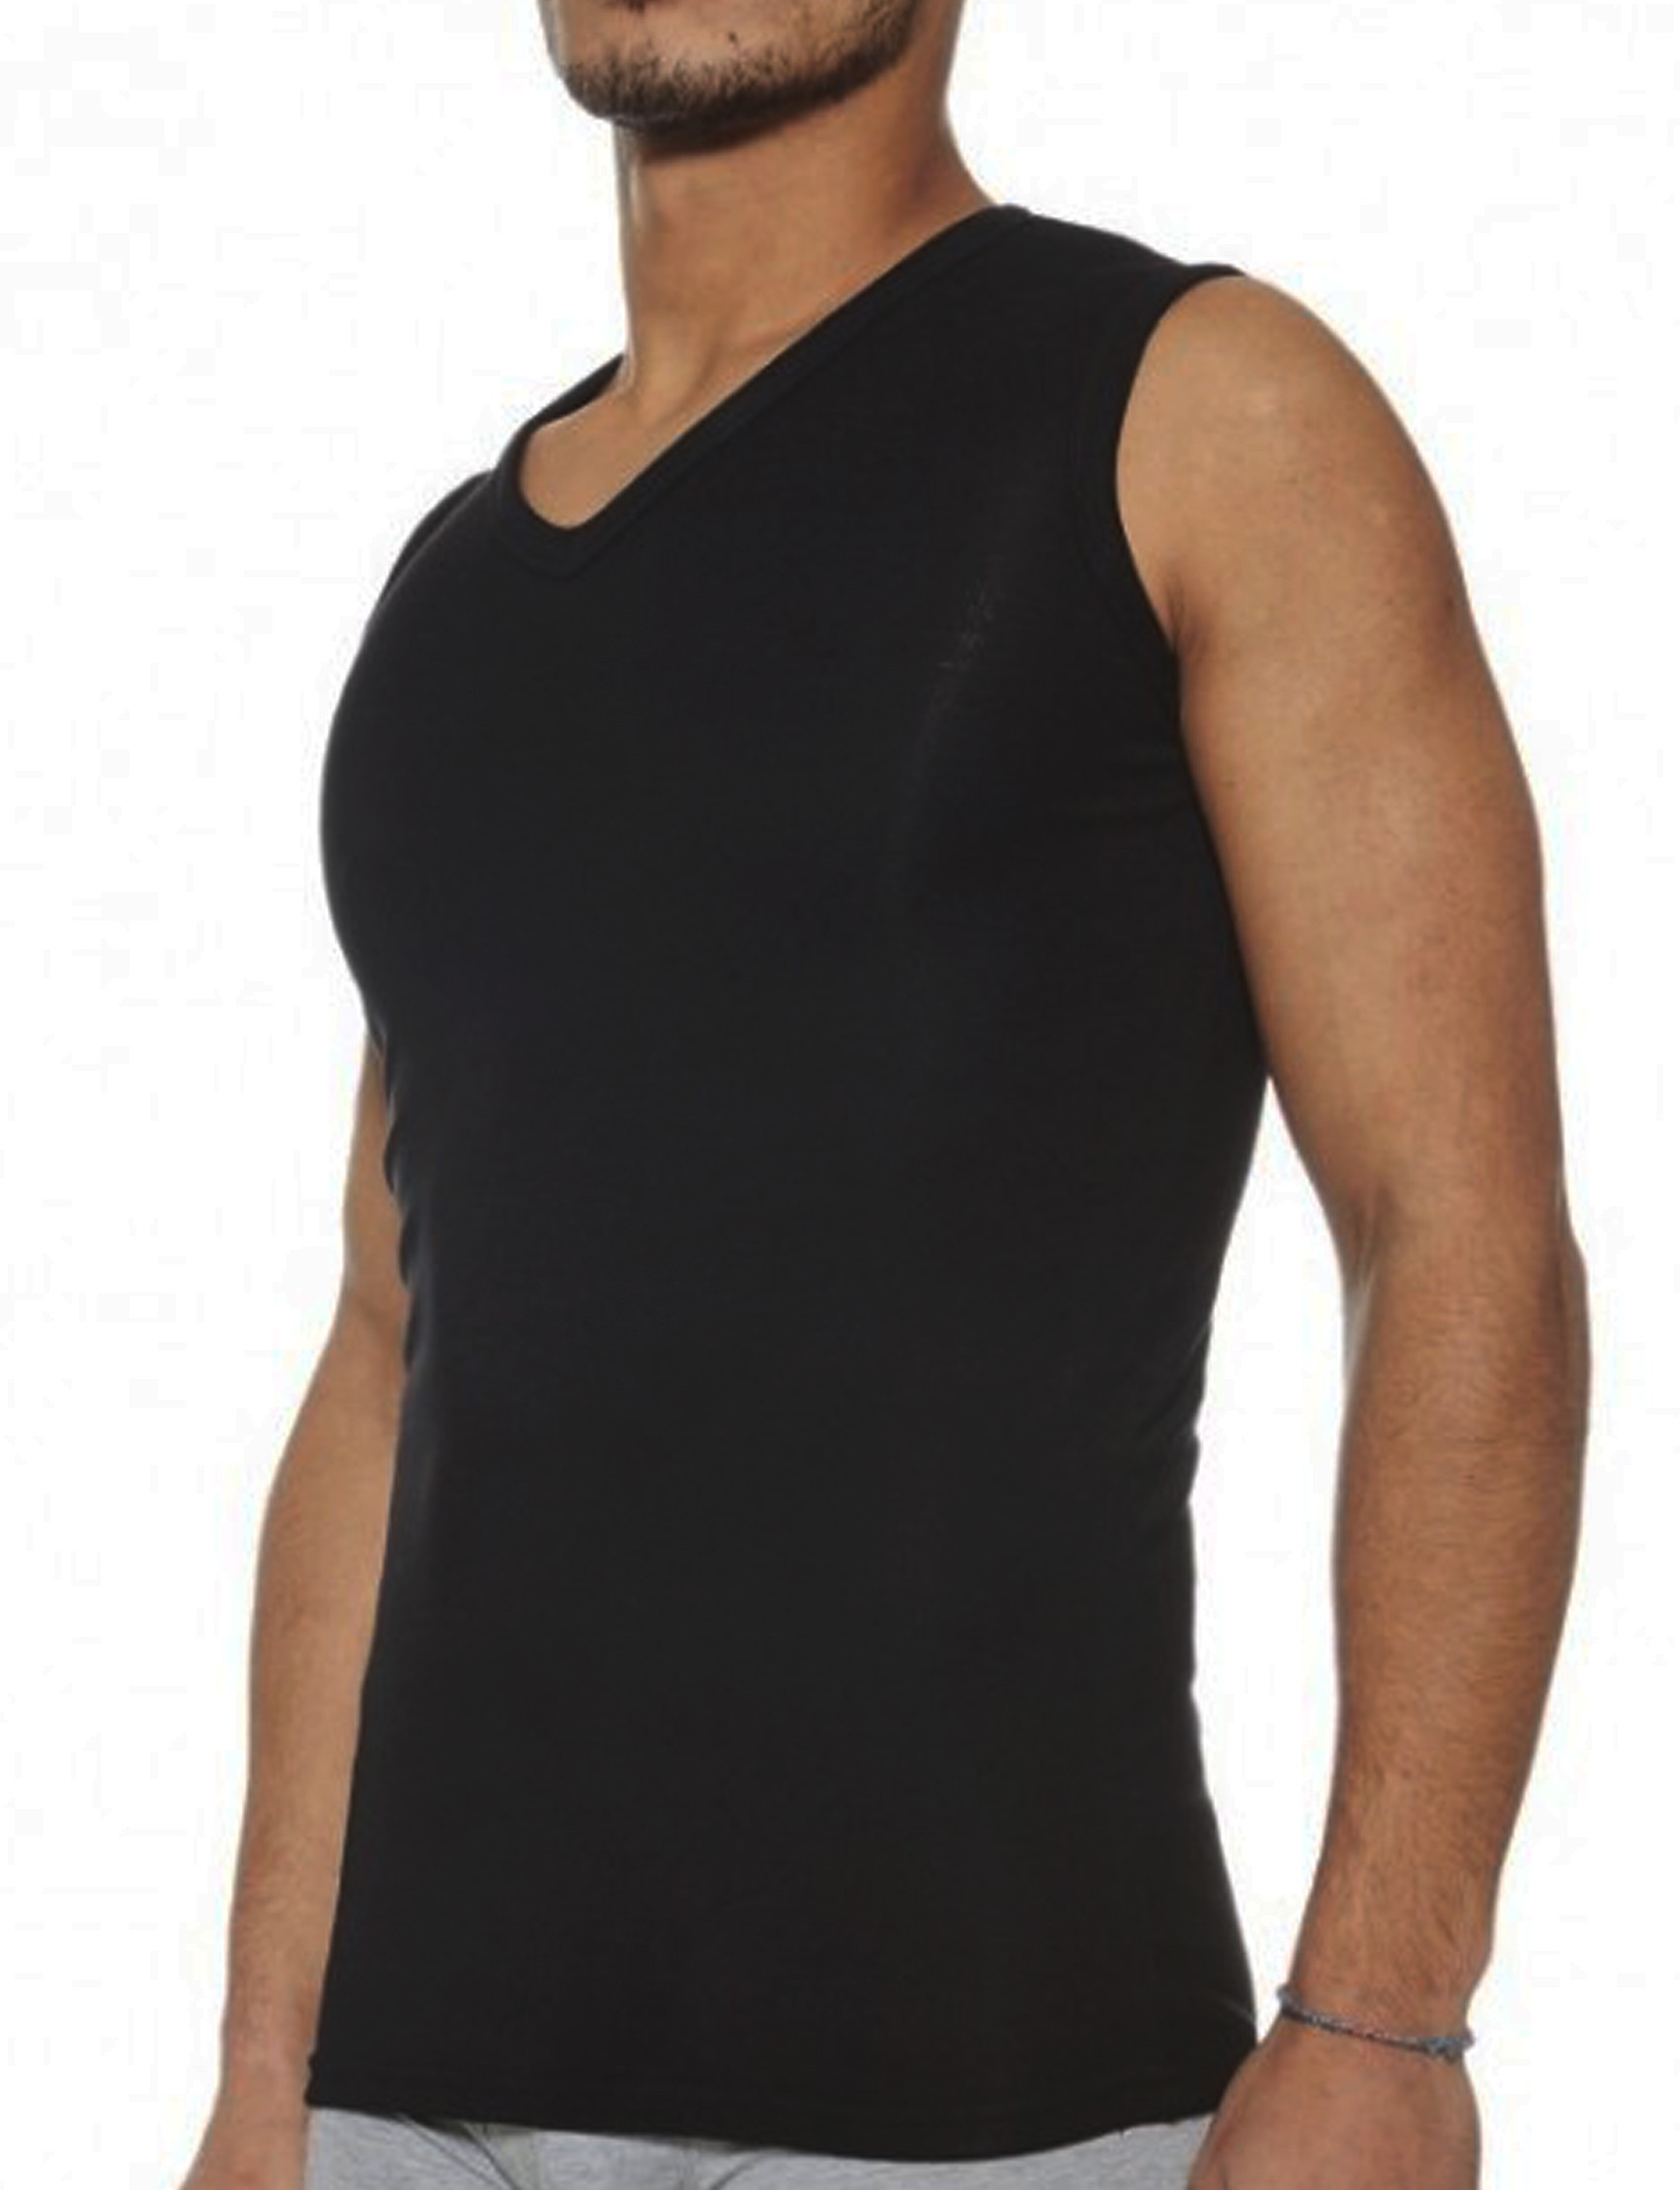 LaModa Ανδρικό Ισοθερμικό φανελάκι αθλητικό Αμάνικο V λαιμόκοψη Λευκό μαύρο  Μαύρο 6ca1862b96a